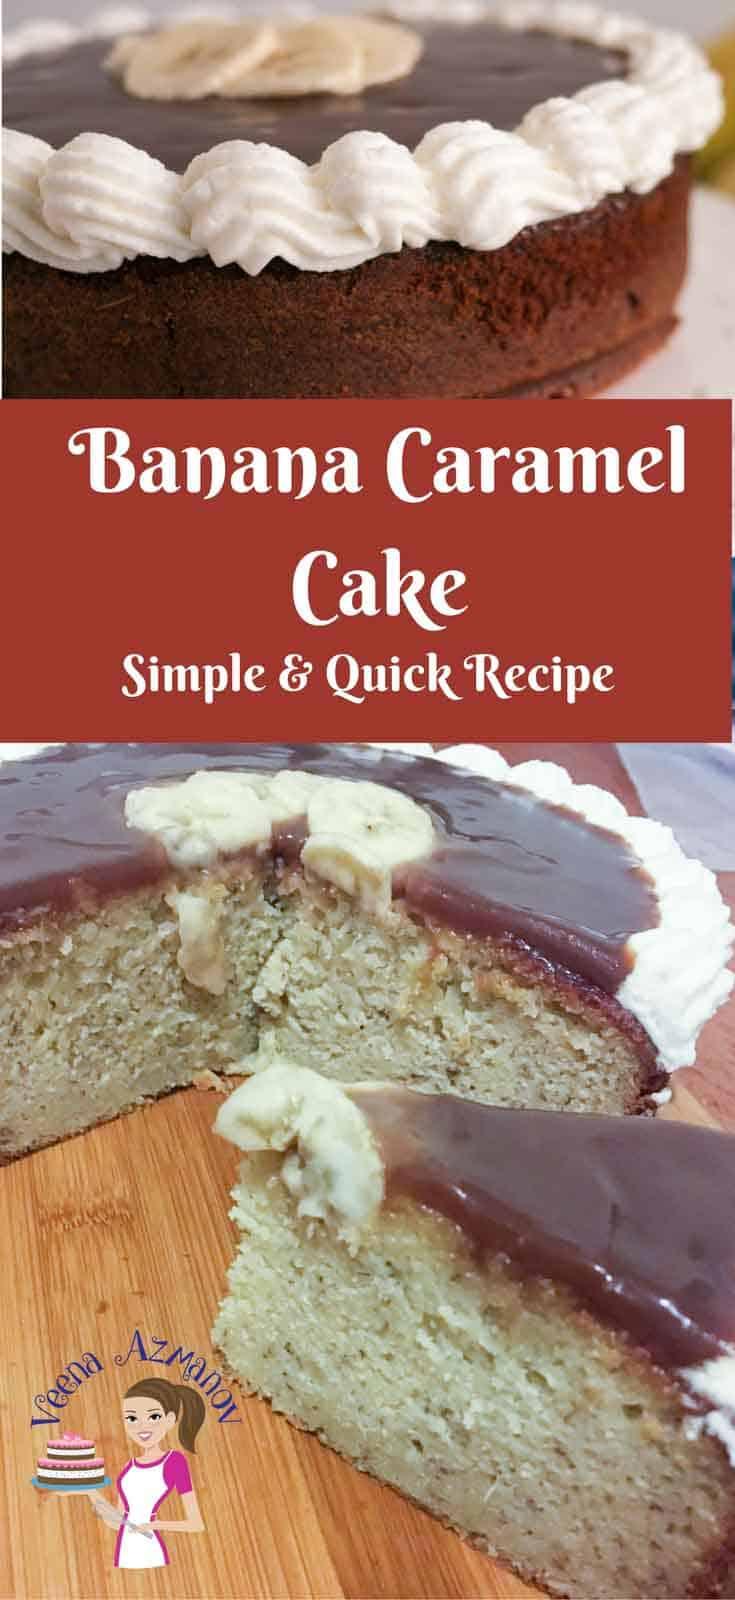 Easy Banana Caramel Cake Quick Amp Simple Recipe Veena Azmanov